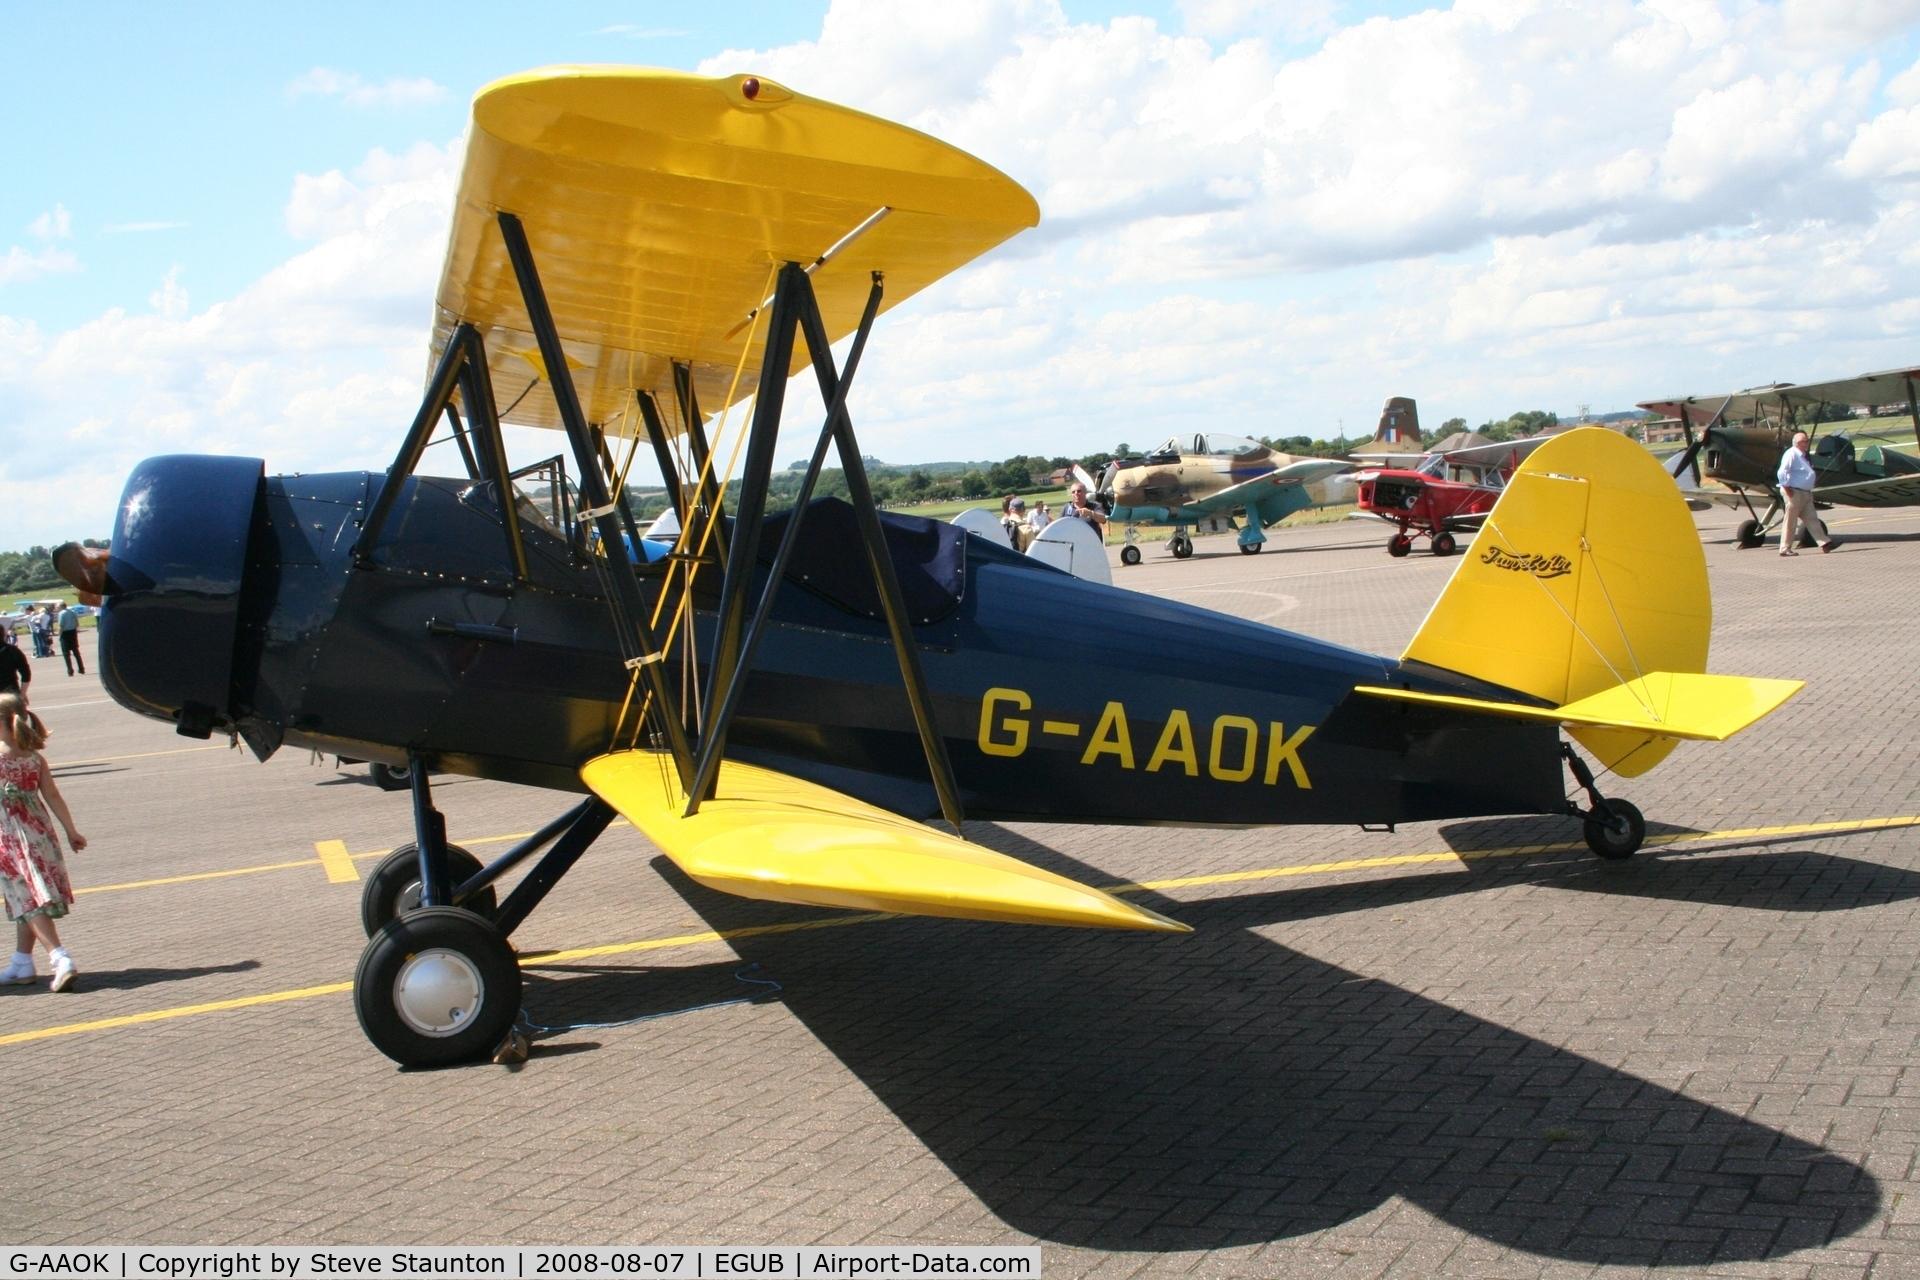 G-AAOK, 1929 Curtiss-Wright Travel Air 12Q C/N 2026, RAF Benson Families Day, RAF Benson, Oxfordshire, England - August 2008